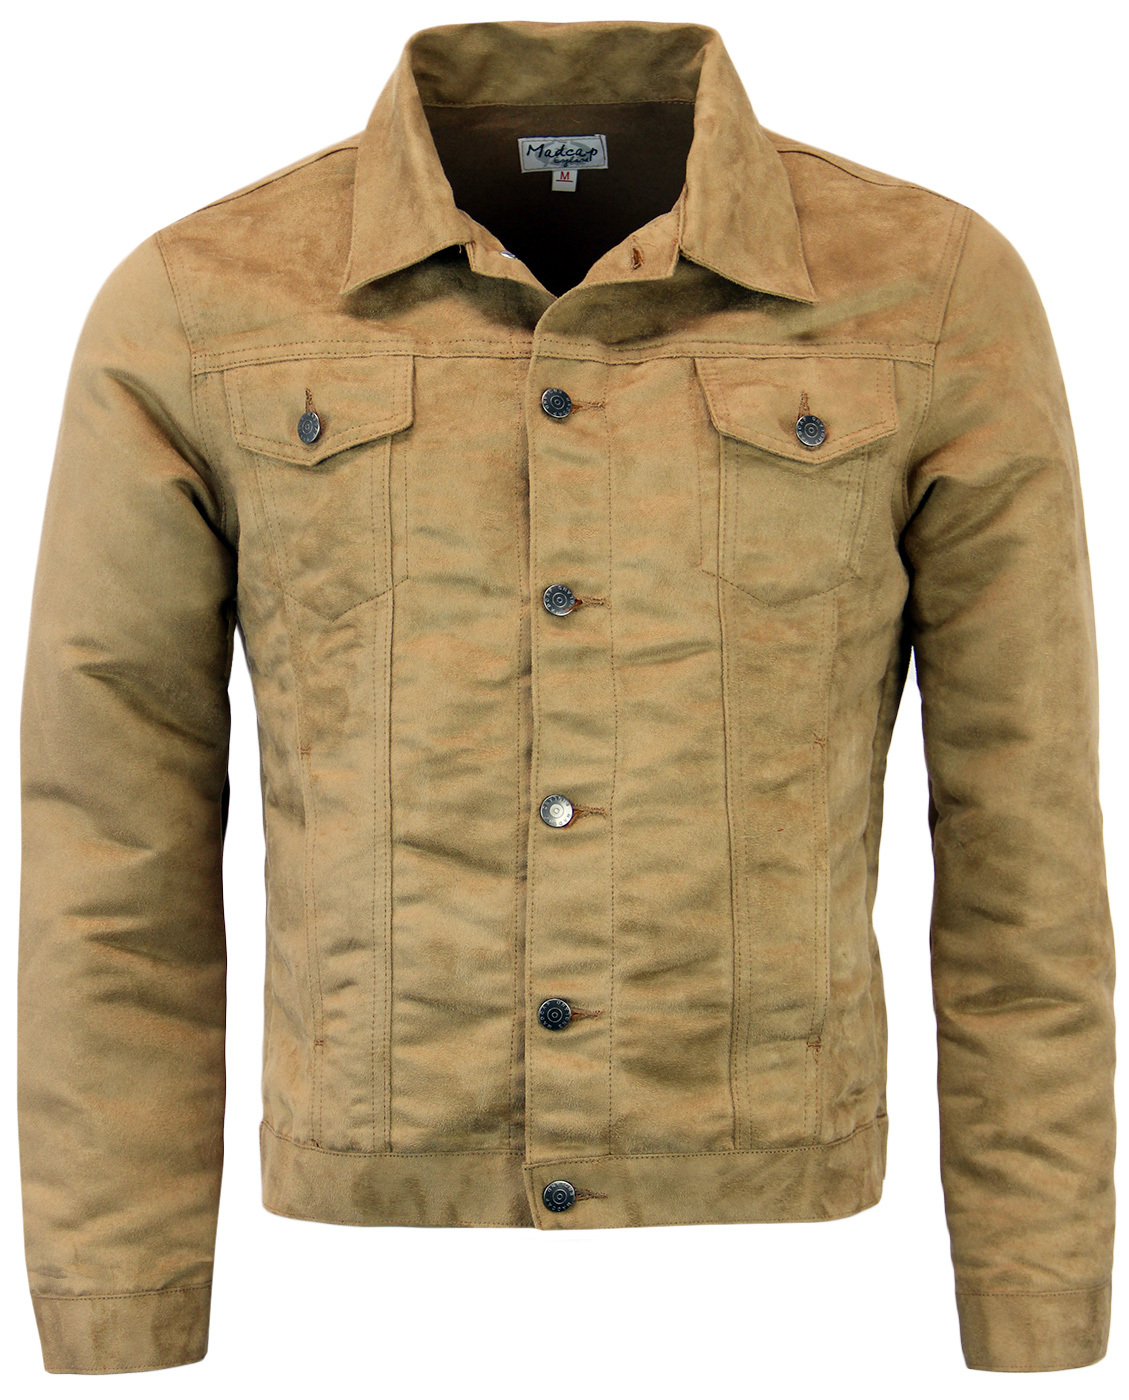 Ealing MADCAP ENGLAND Retro Mod Faux Suede Jacket